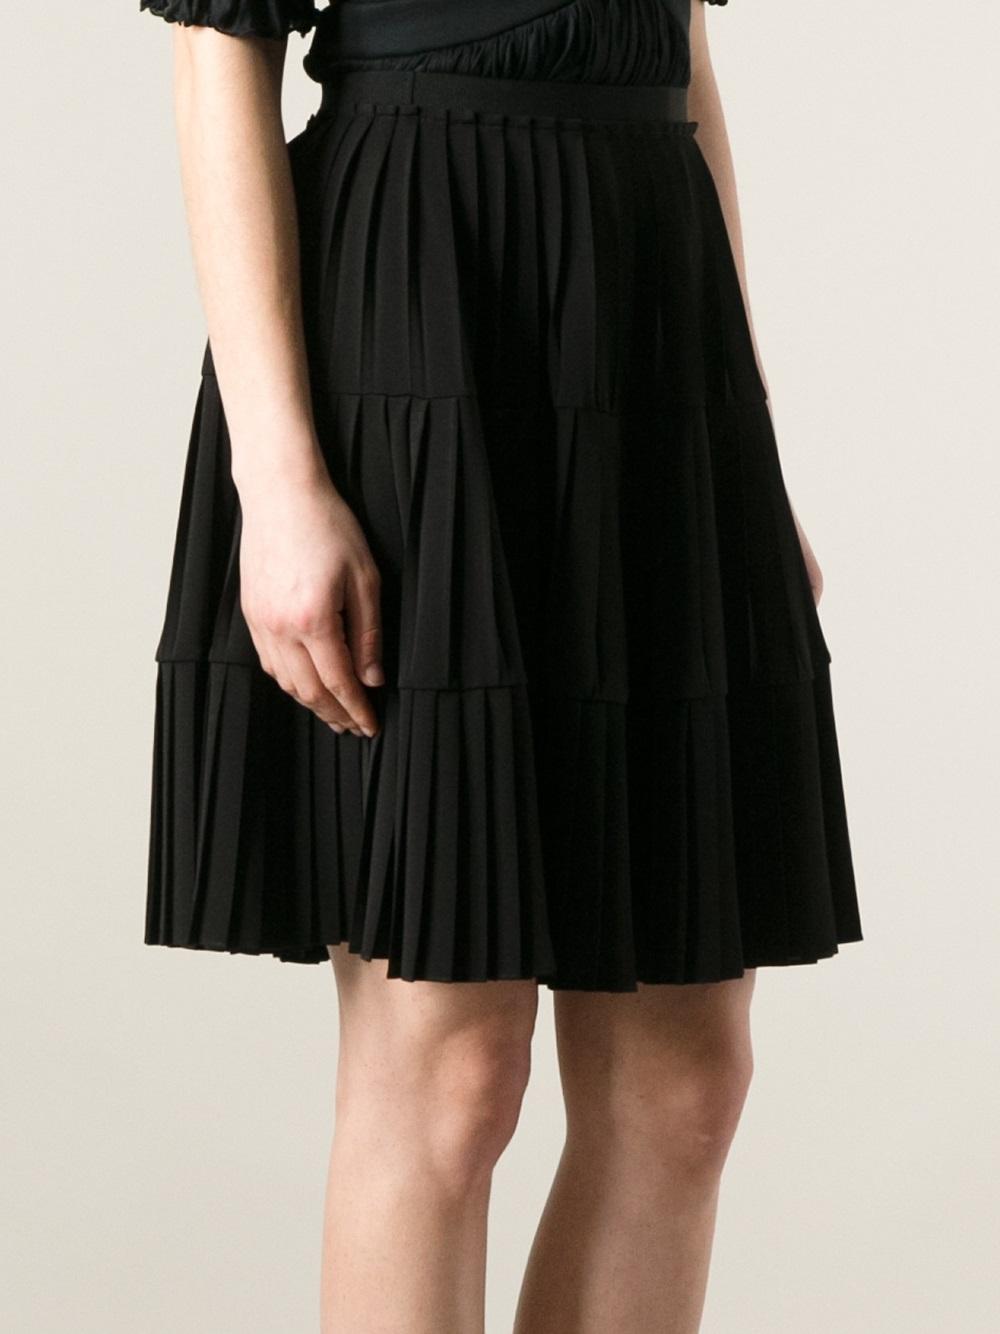 af80b1ef29 Givenchy Pleated Skirt in Black - Lyst